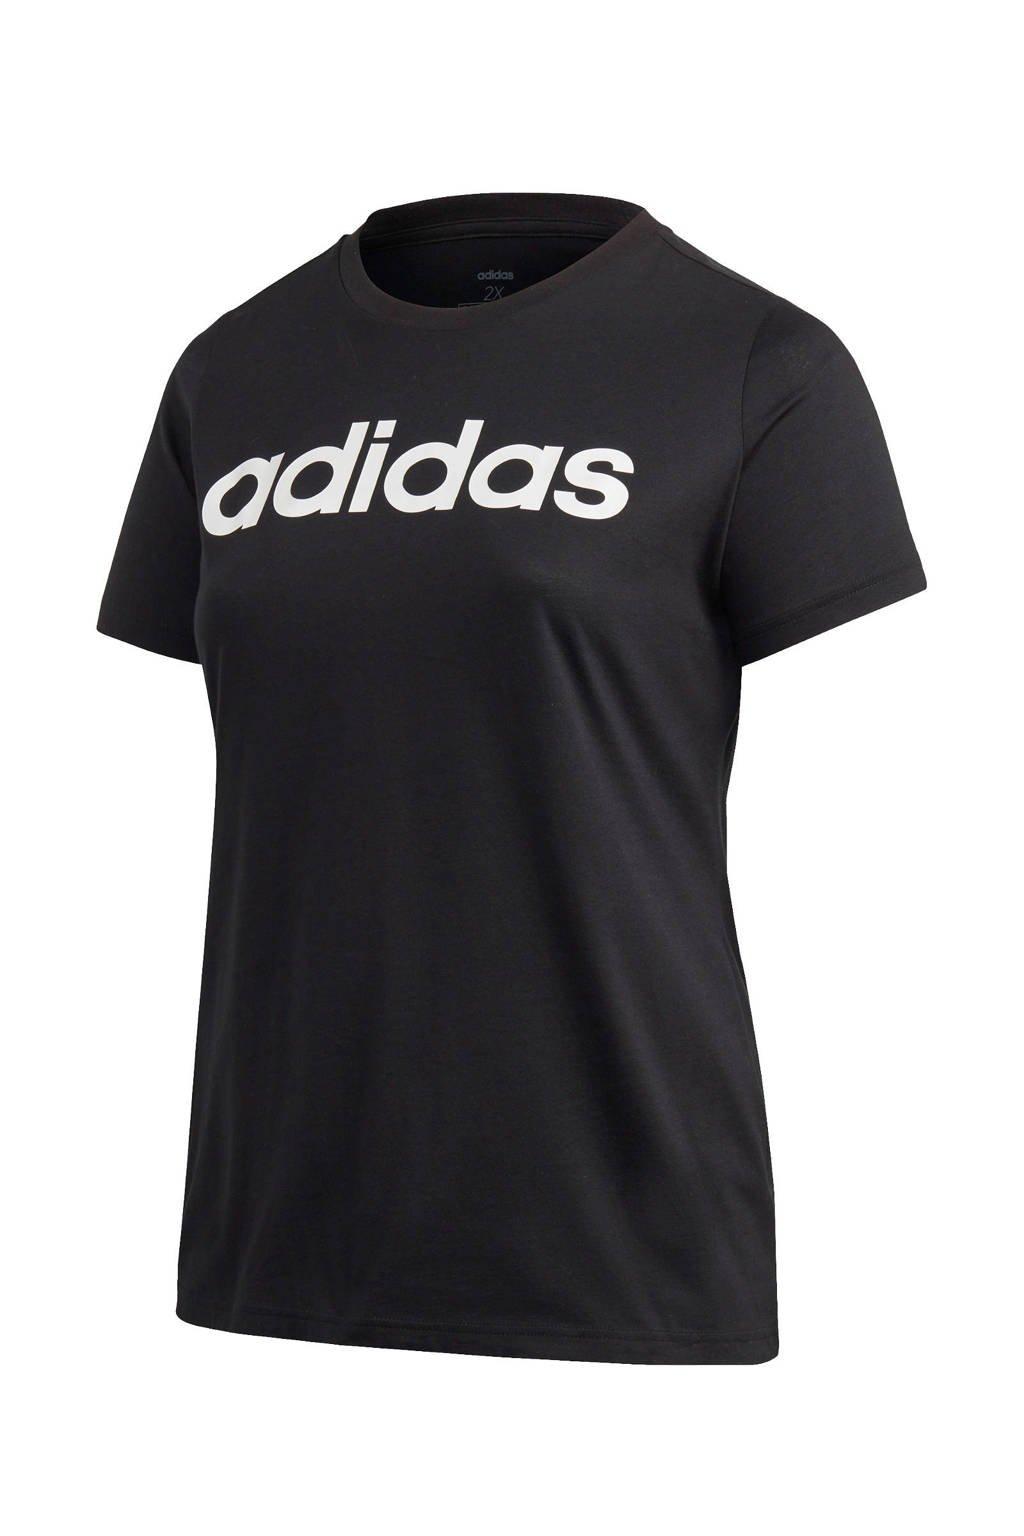 adidas Performance Plus Size sport T-shirt zwart, Zwart/wit